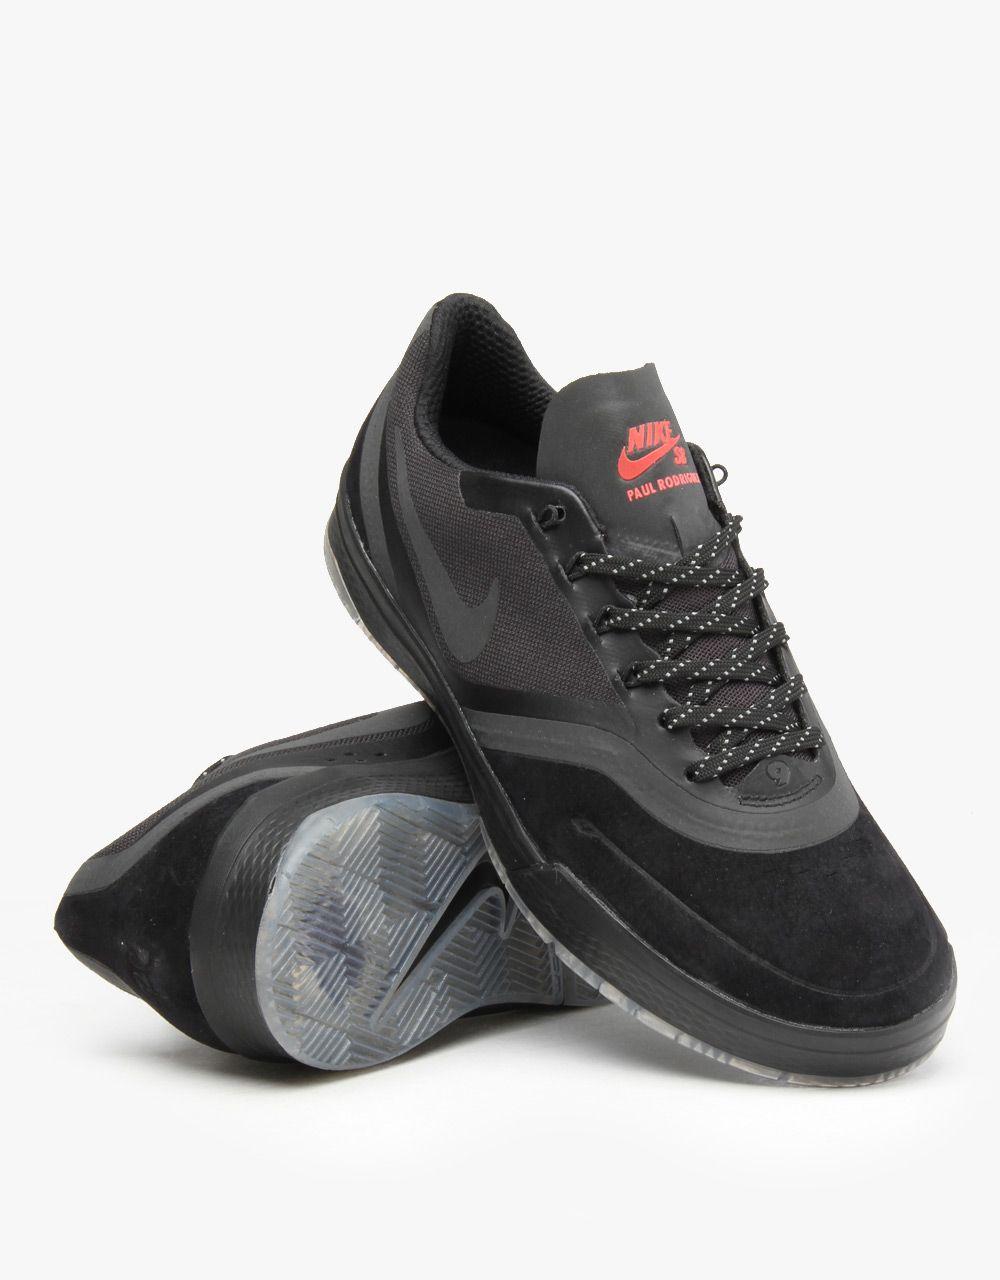 Nike SB Paul Rodriguez 9 Elite Flash Skate Shoes  BlackBlackCrimson